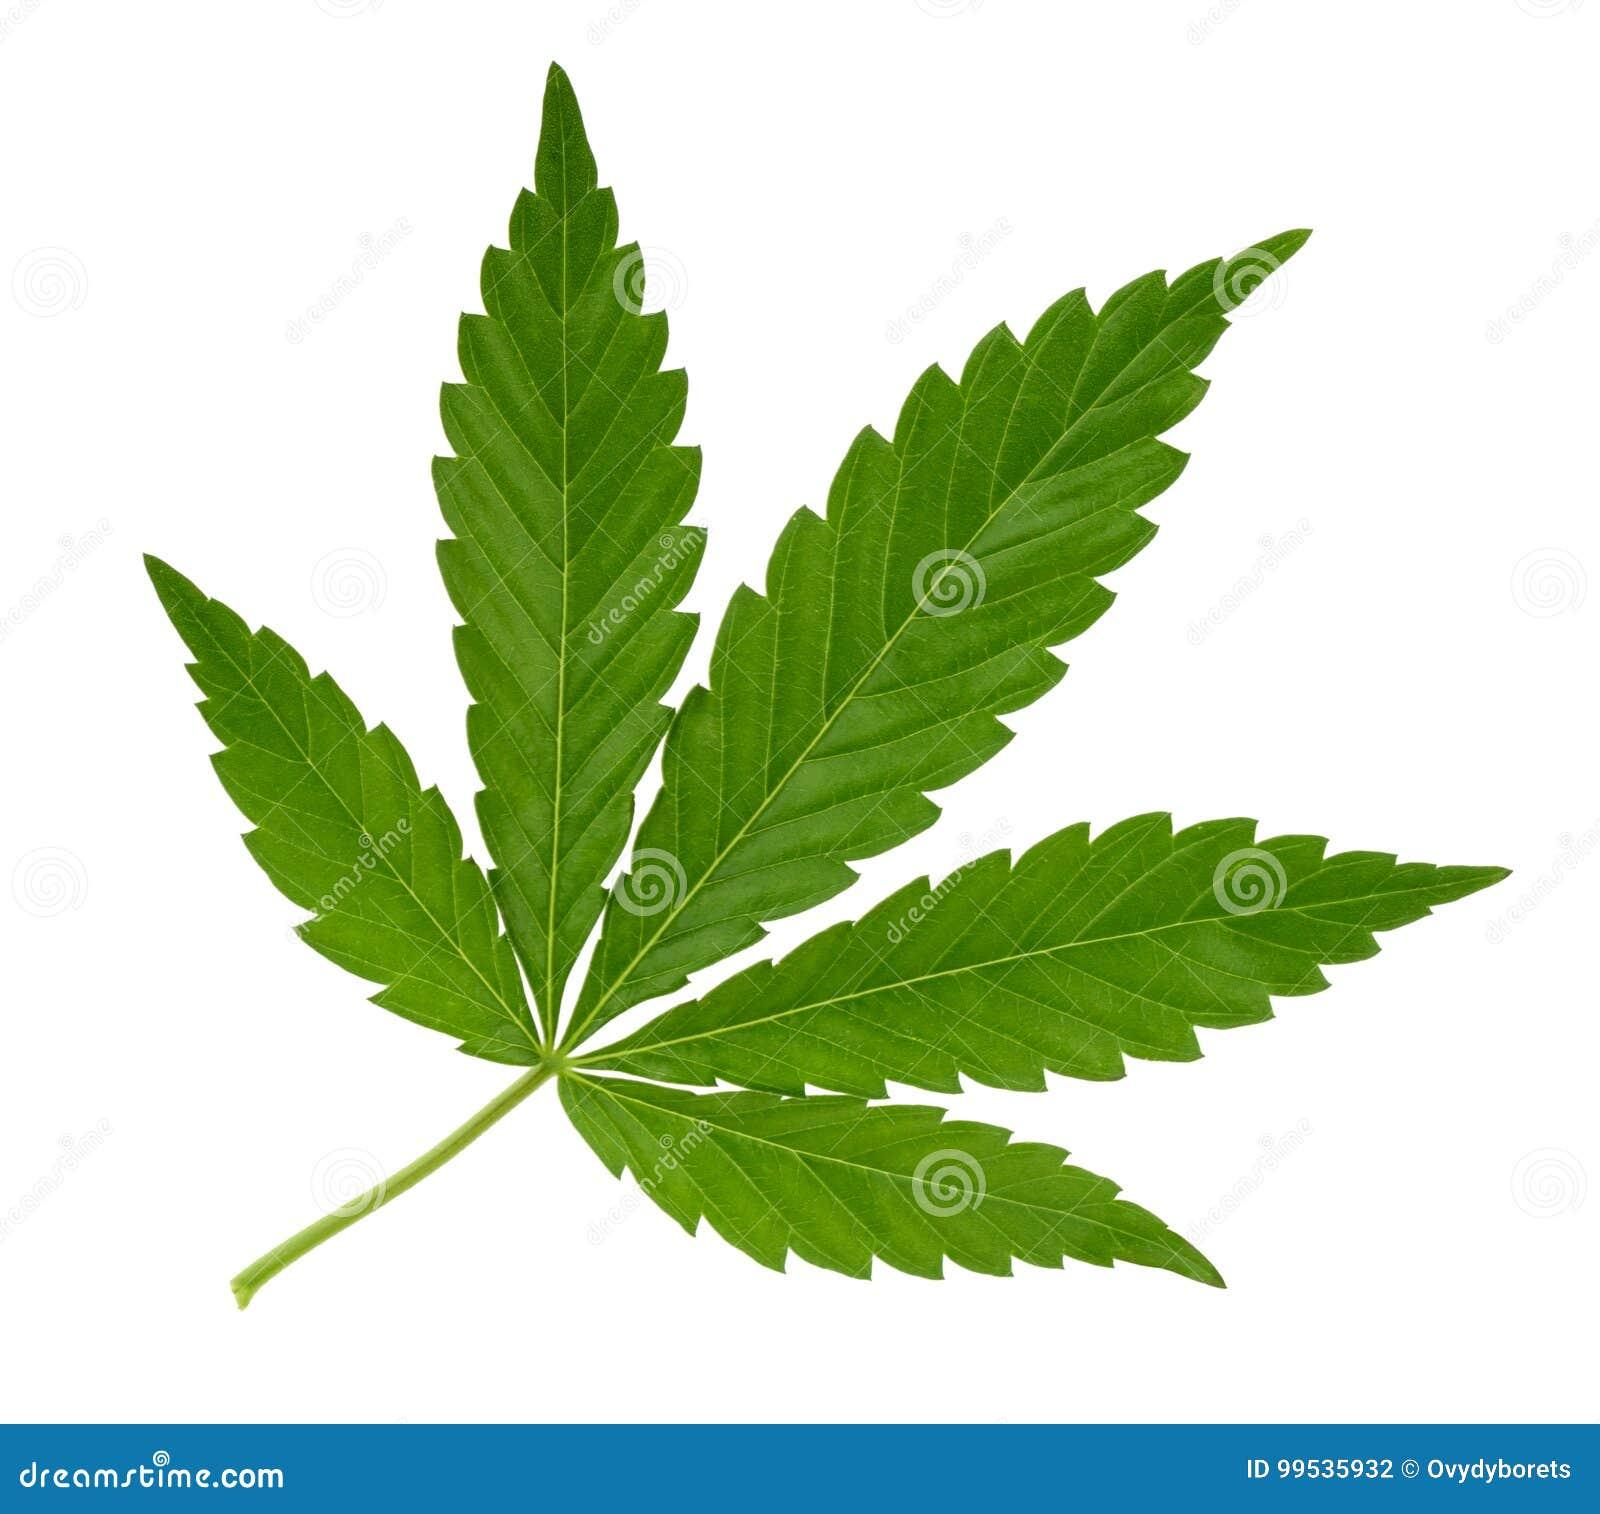 Folha do cannabis isolada no branco sem sombra